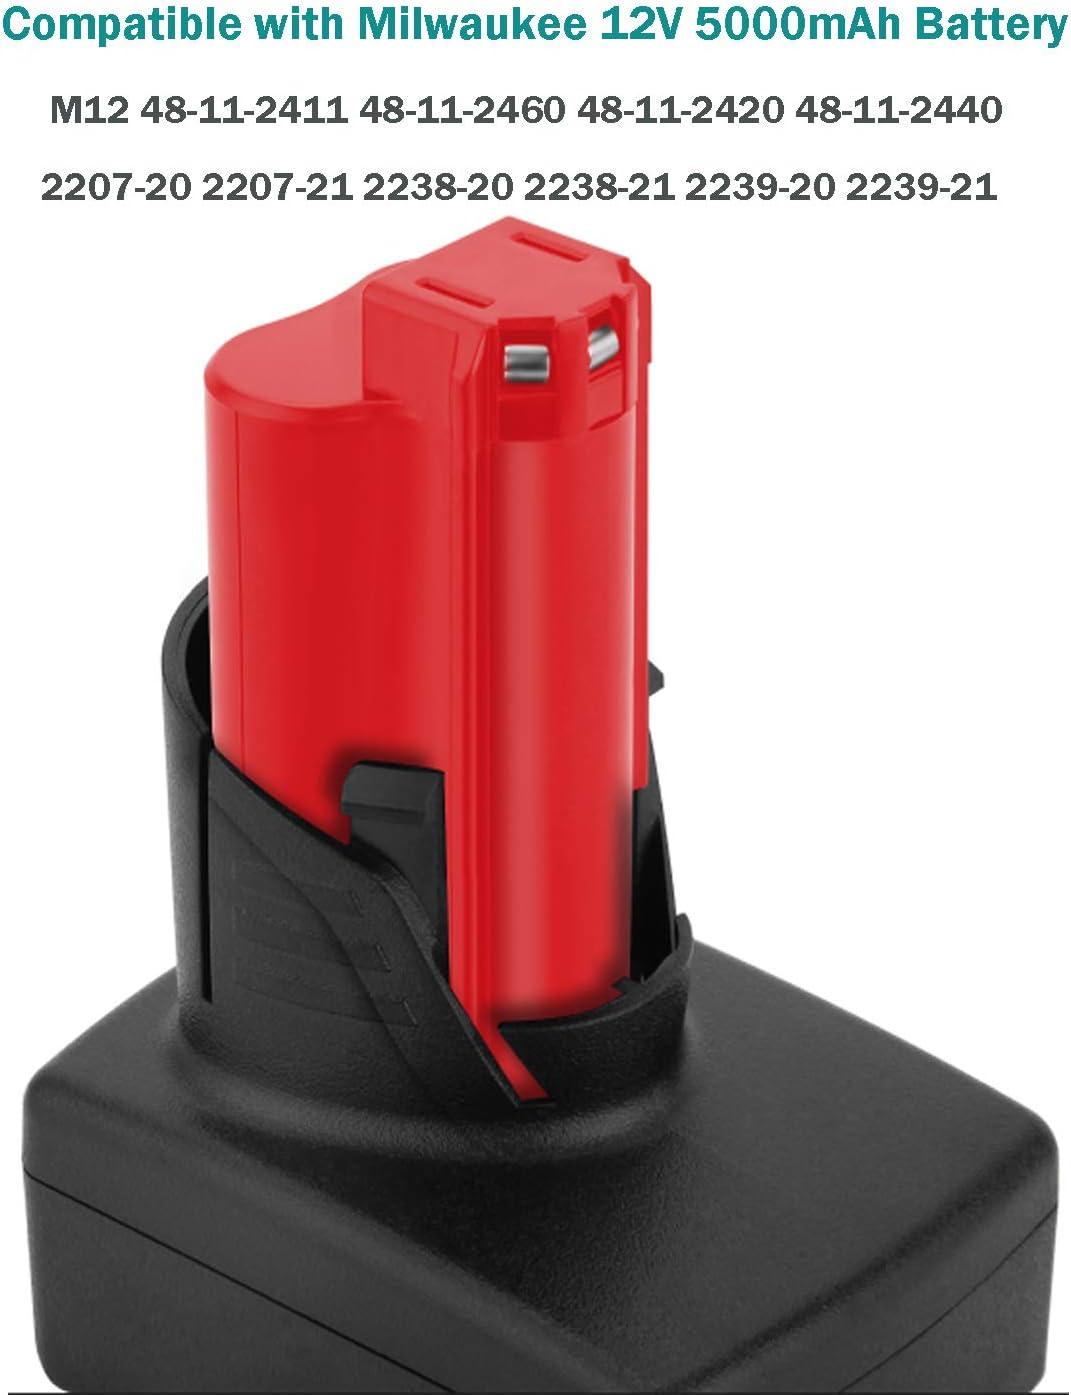 VANON Bater/ía de repuesto para Milwaukee m12 XC 48-11-2410 48-11-2420 48-11-2411 48-11-2401 48-11-2402